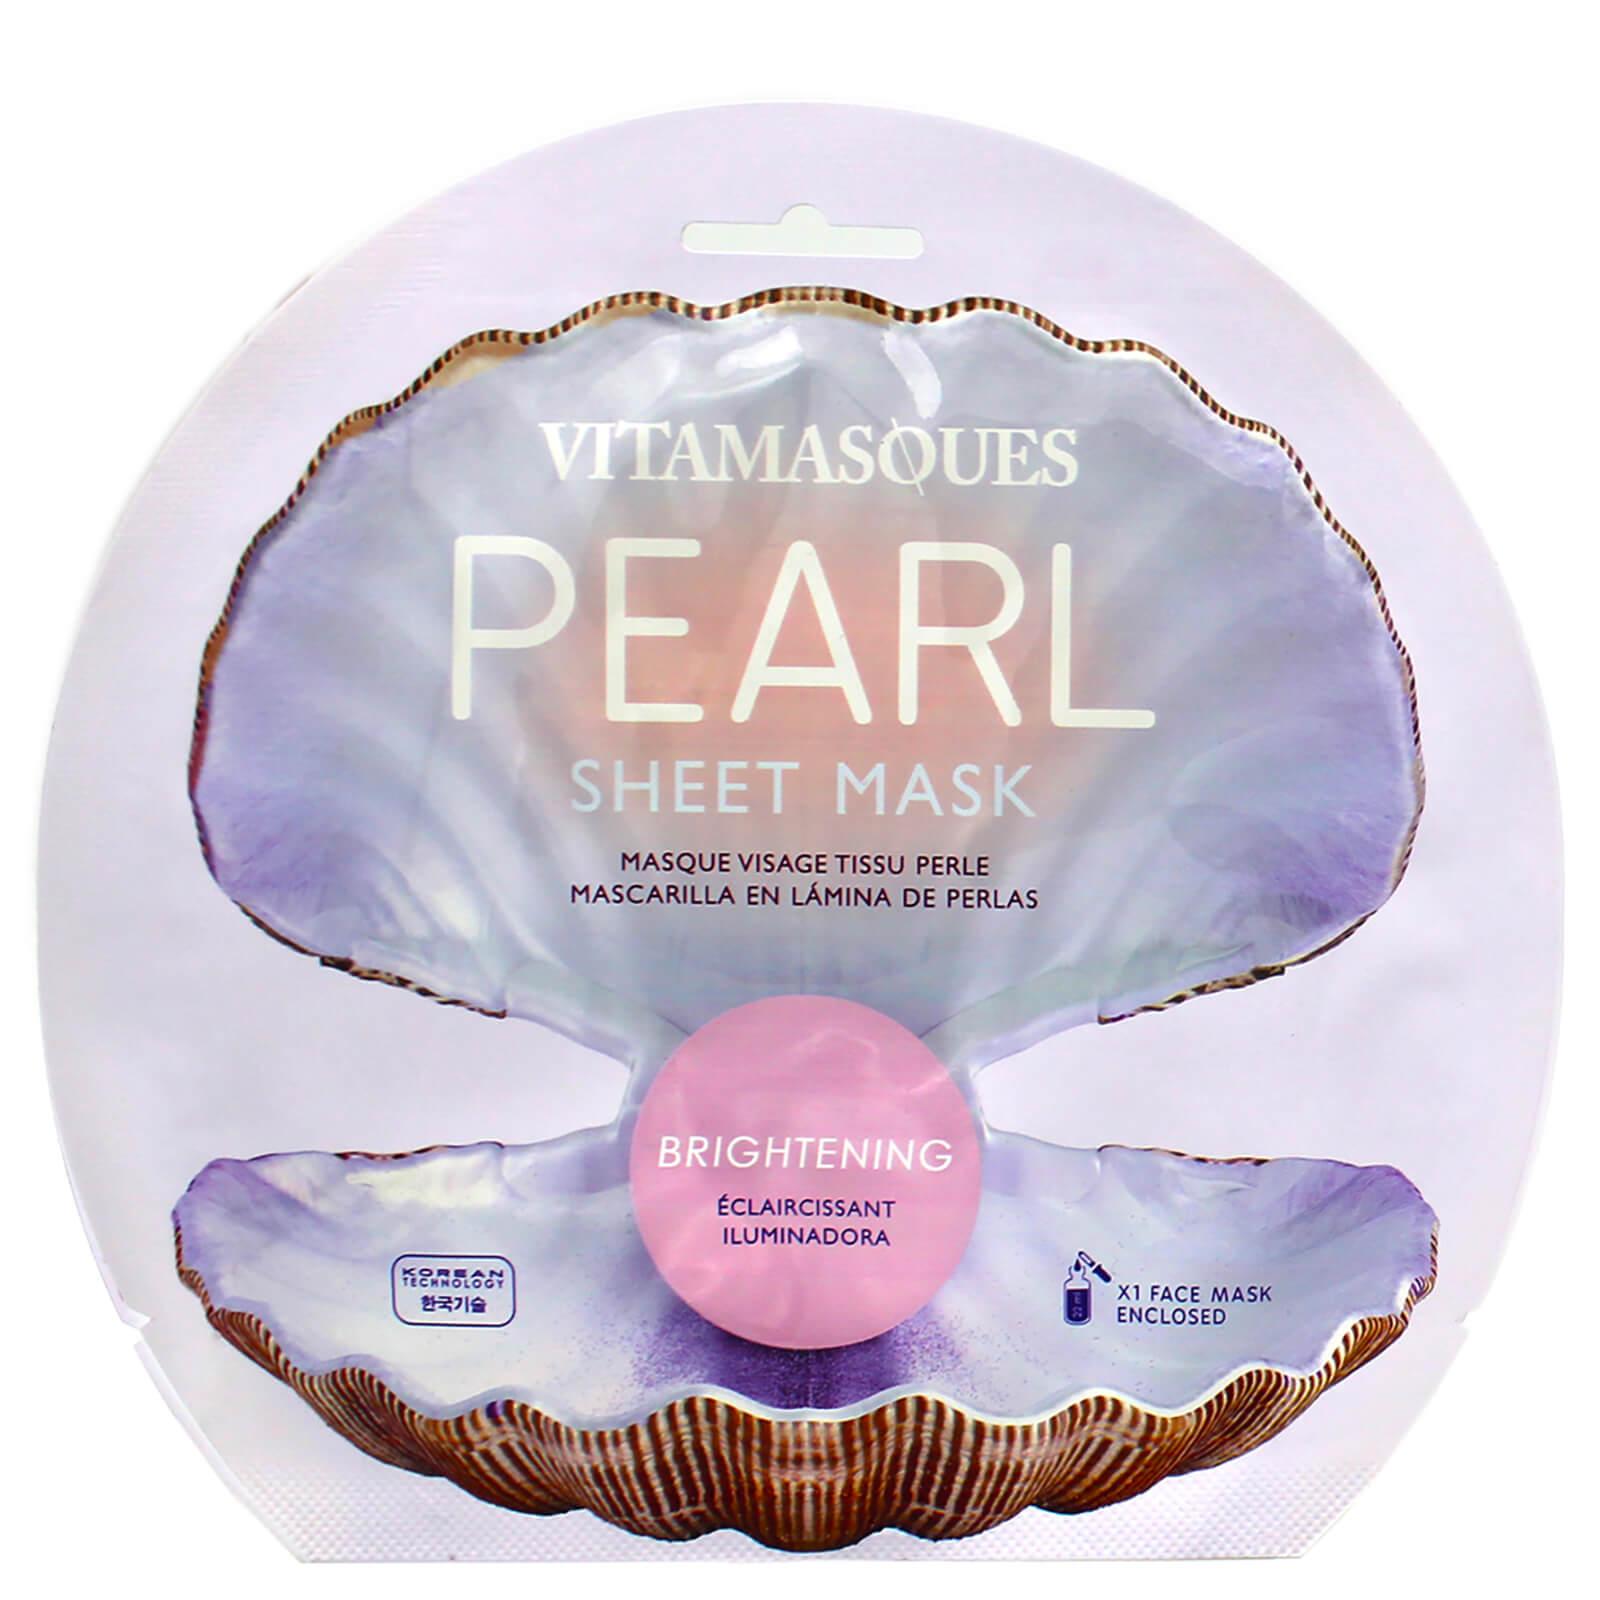 Купить Vitamasques Pearl Sheet Mask 20ml